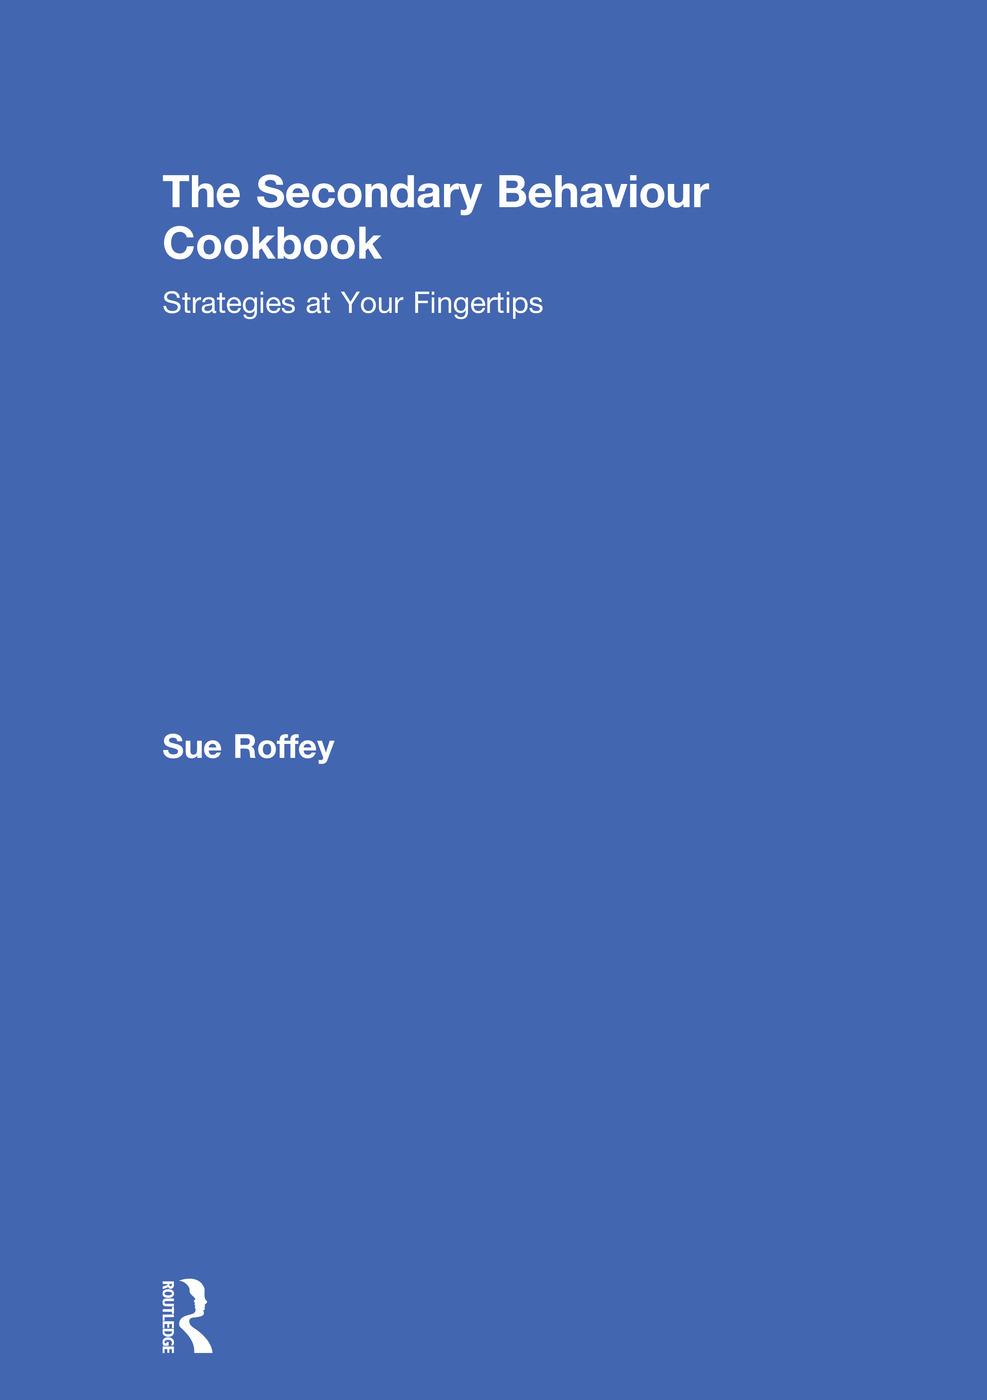 The Secondary Behaviour Cookbook